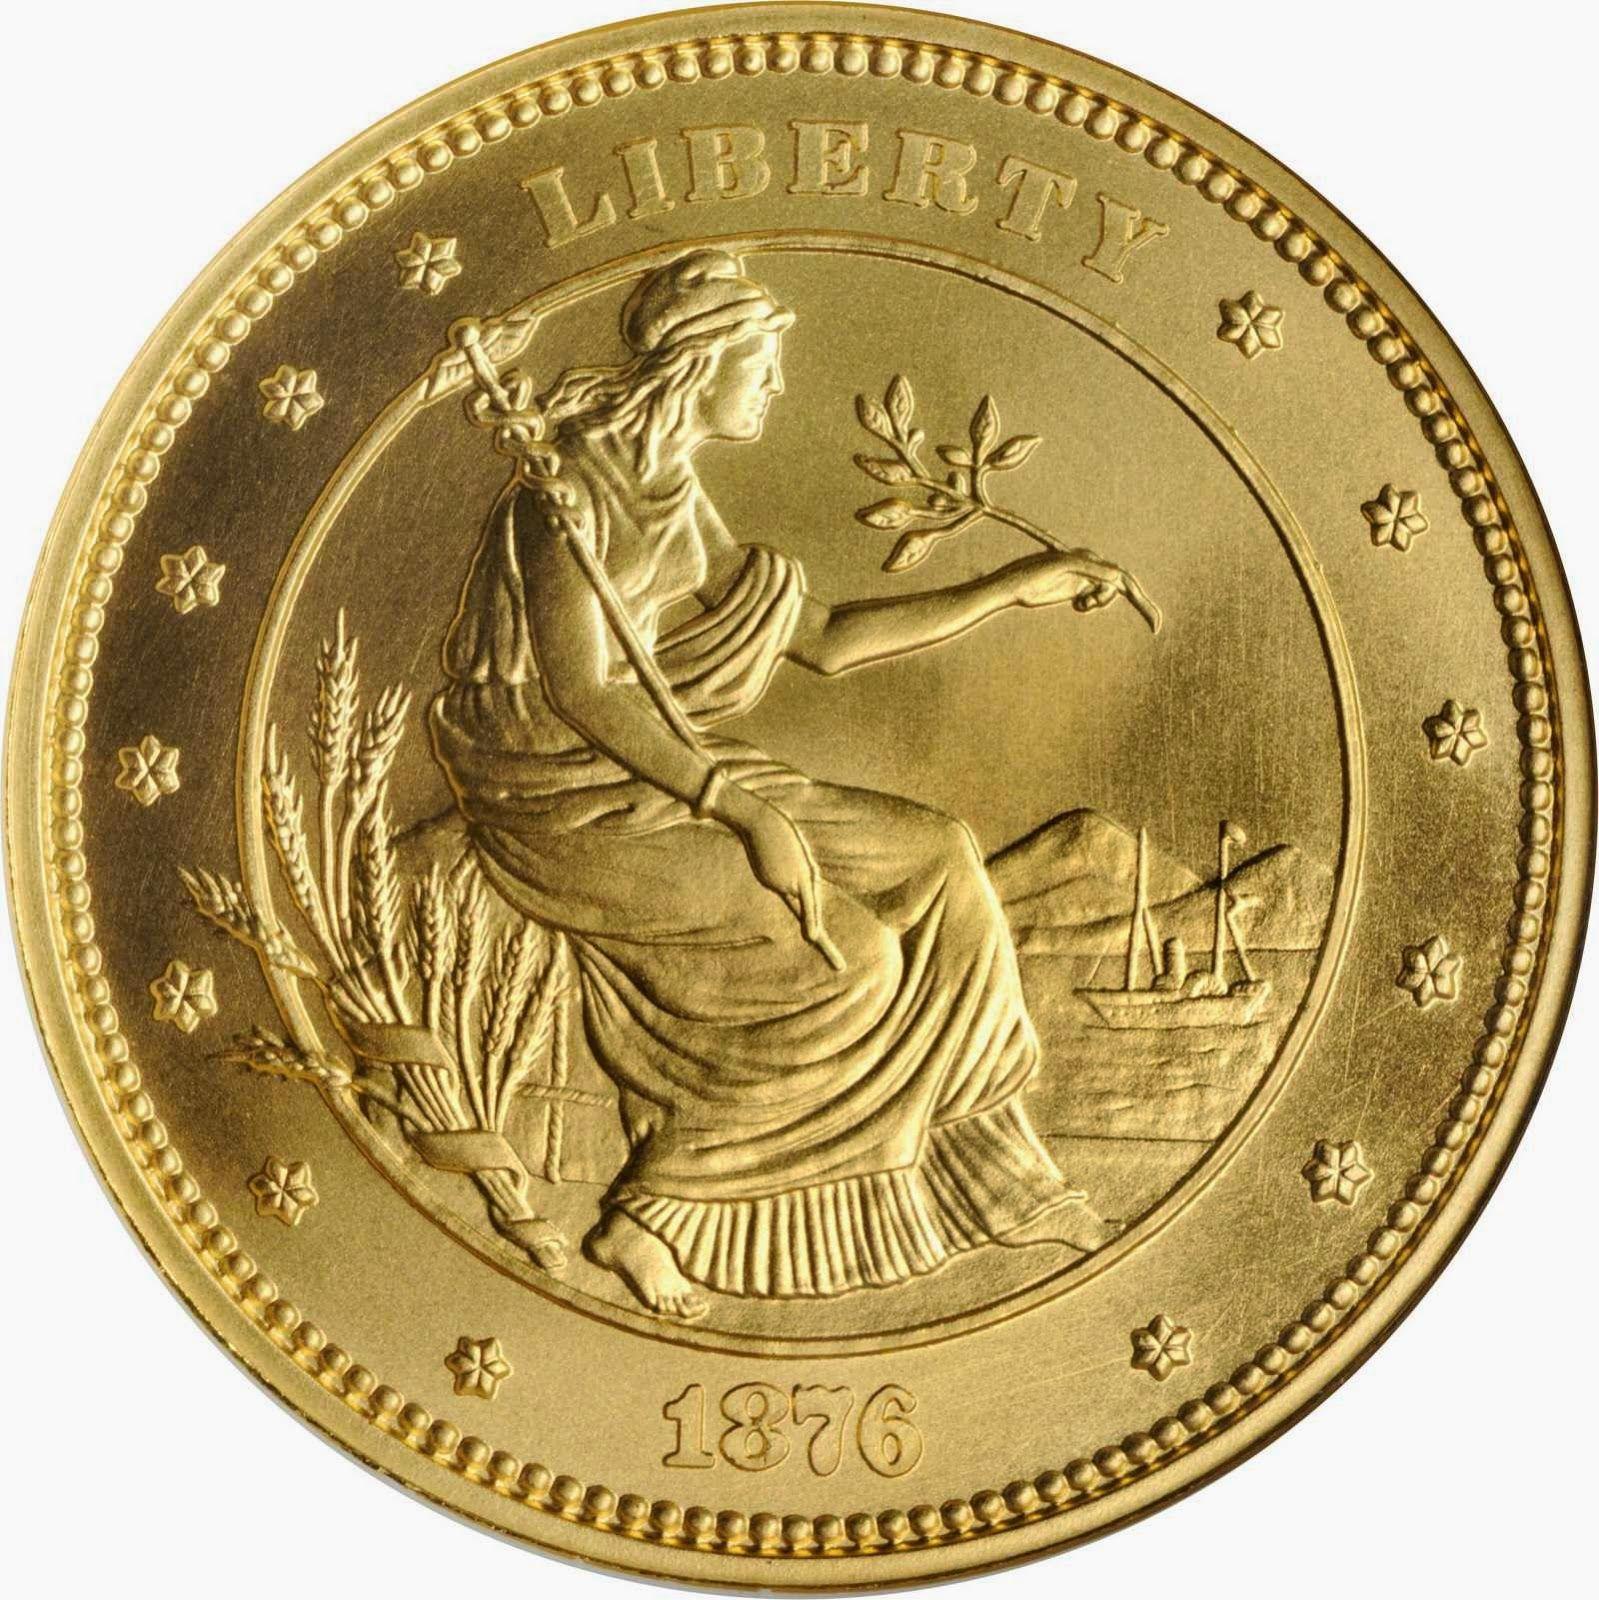 George T Morgan 100 Gold Union Proposed Design